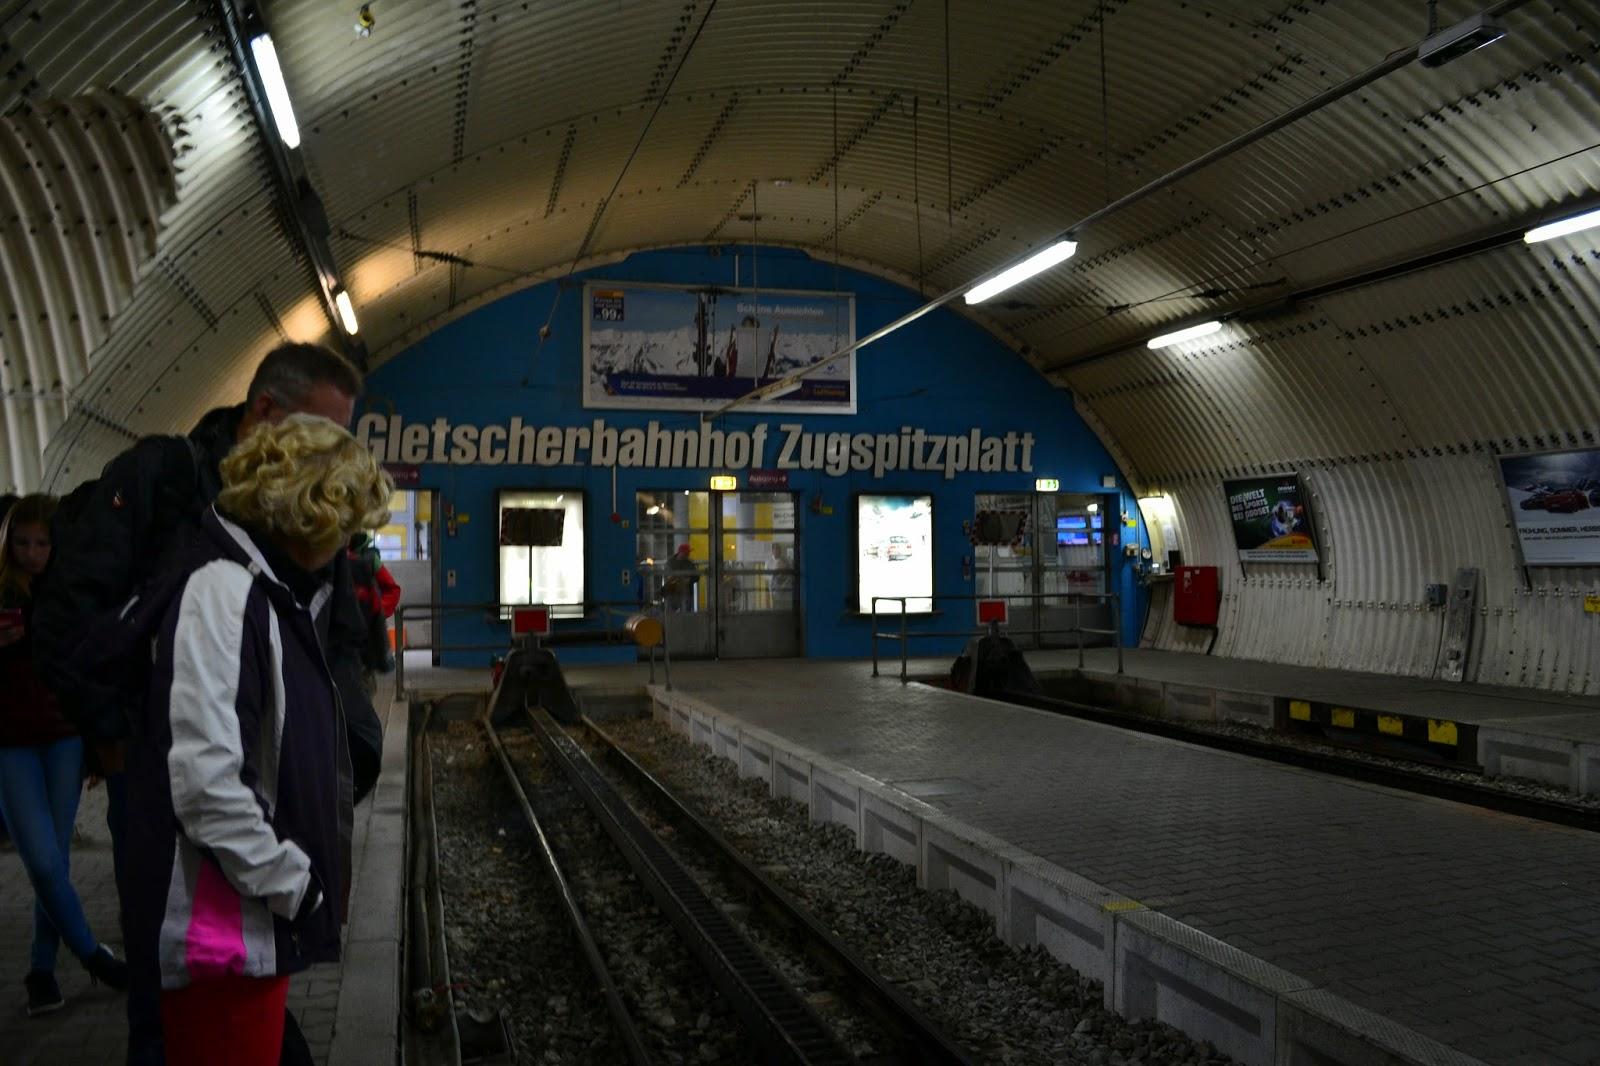 Bahnhof Zugspitzplatt